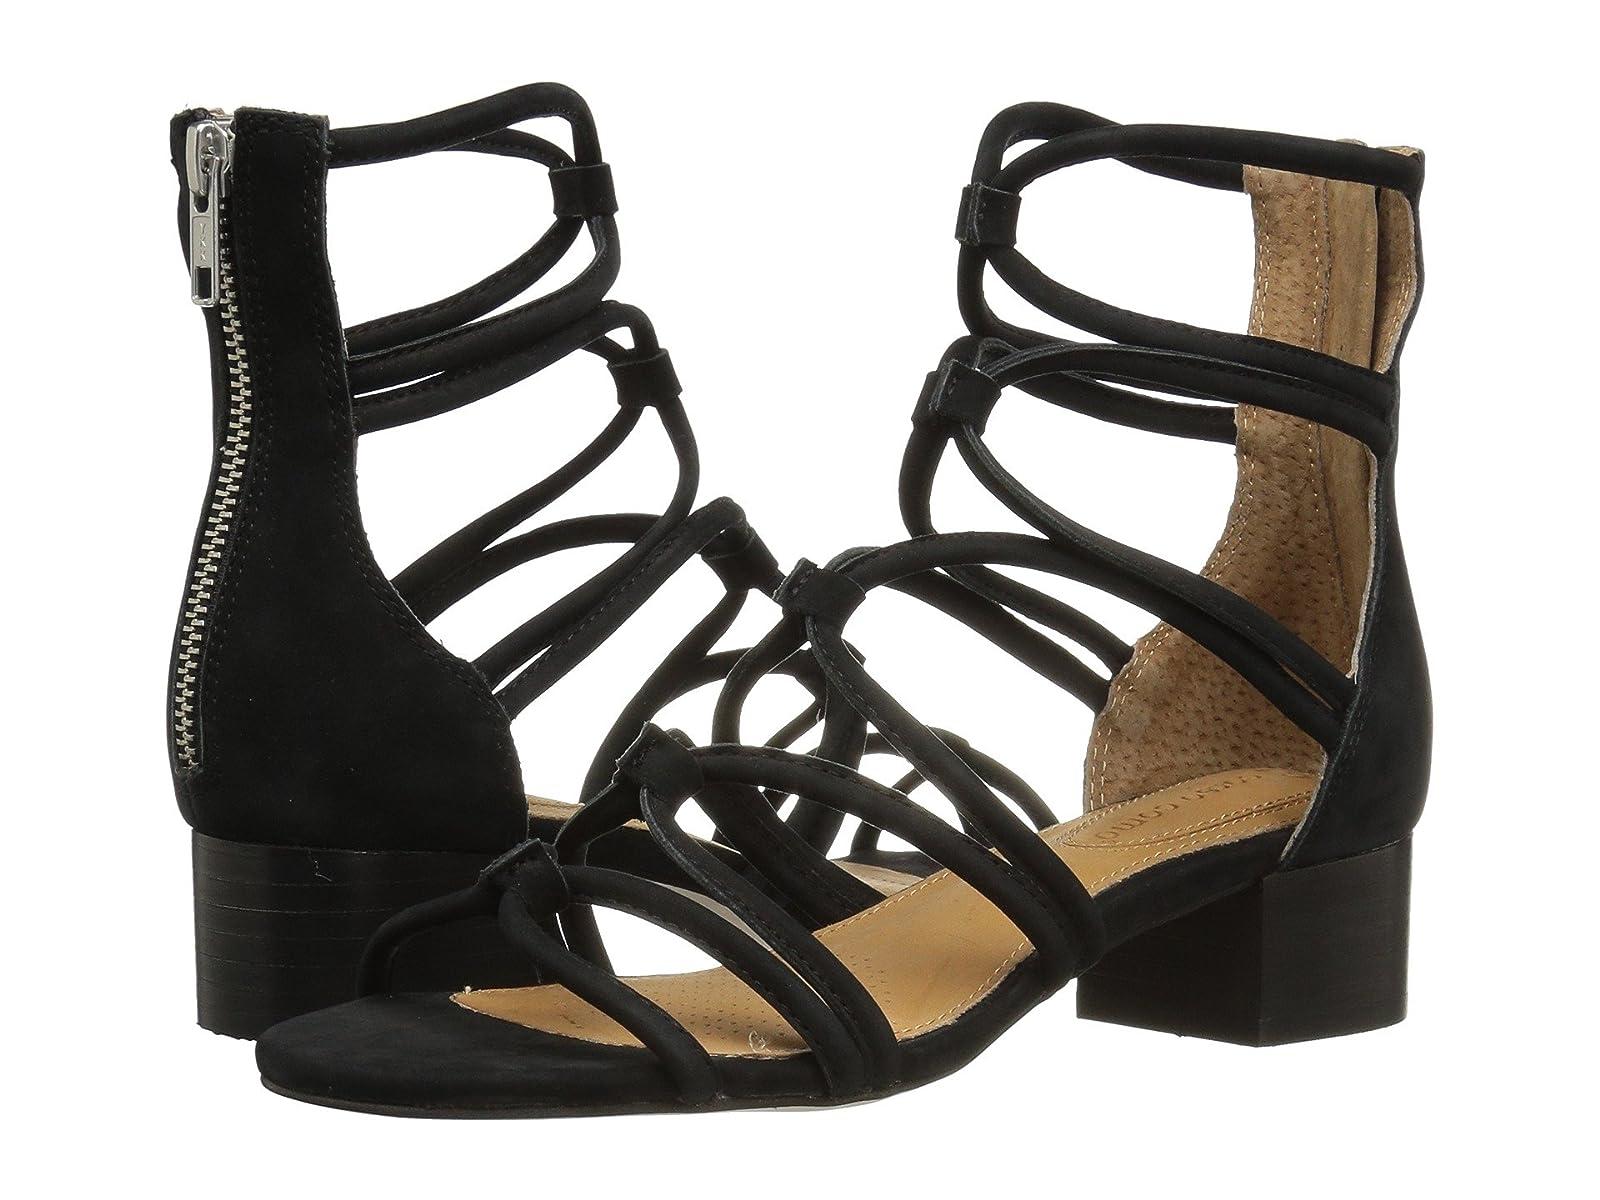 CC Corso Como JenkinsCheap and distinctive eye-catching shoes